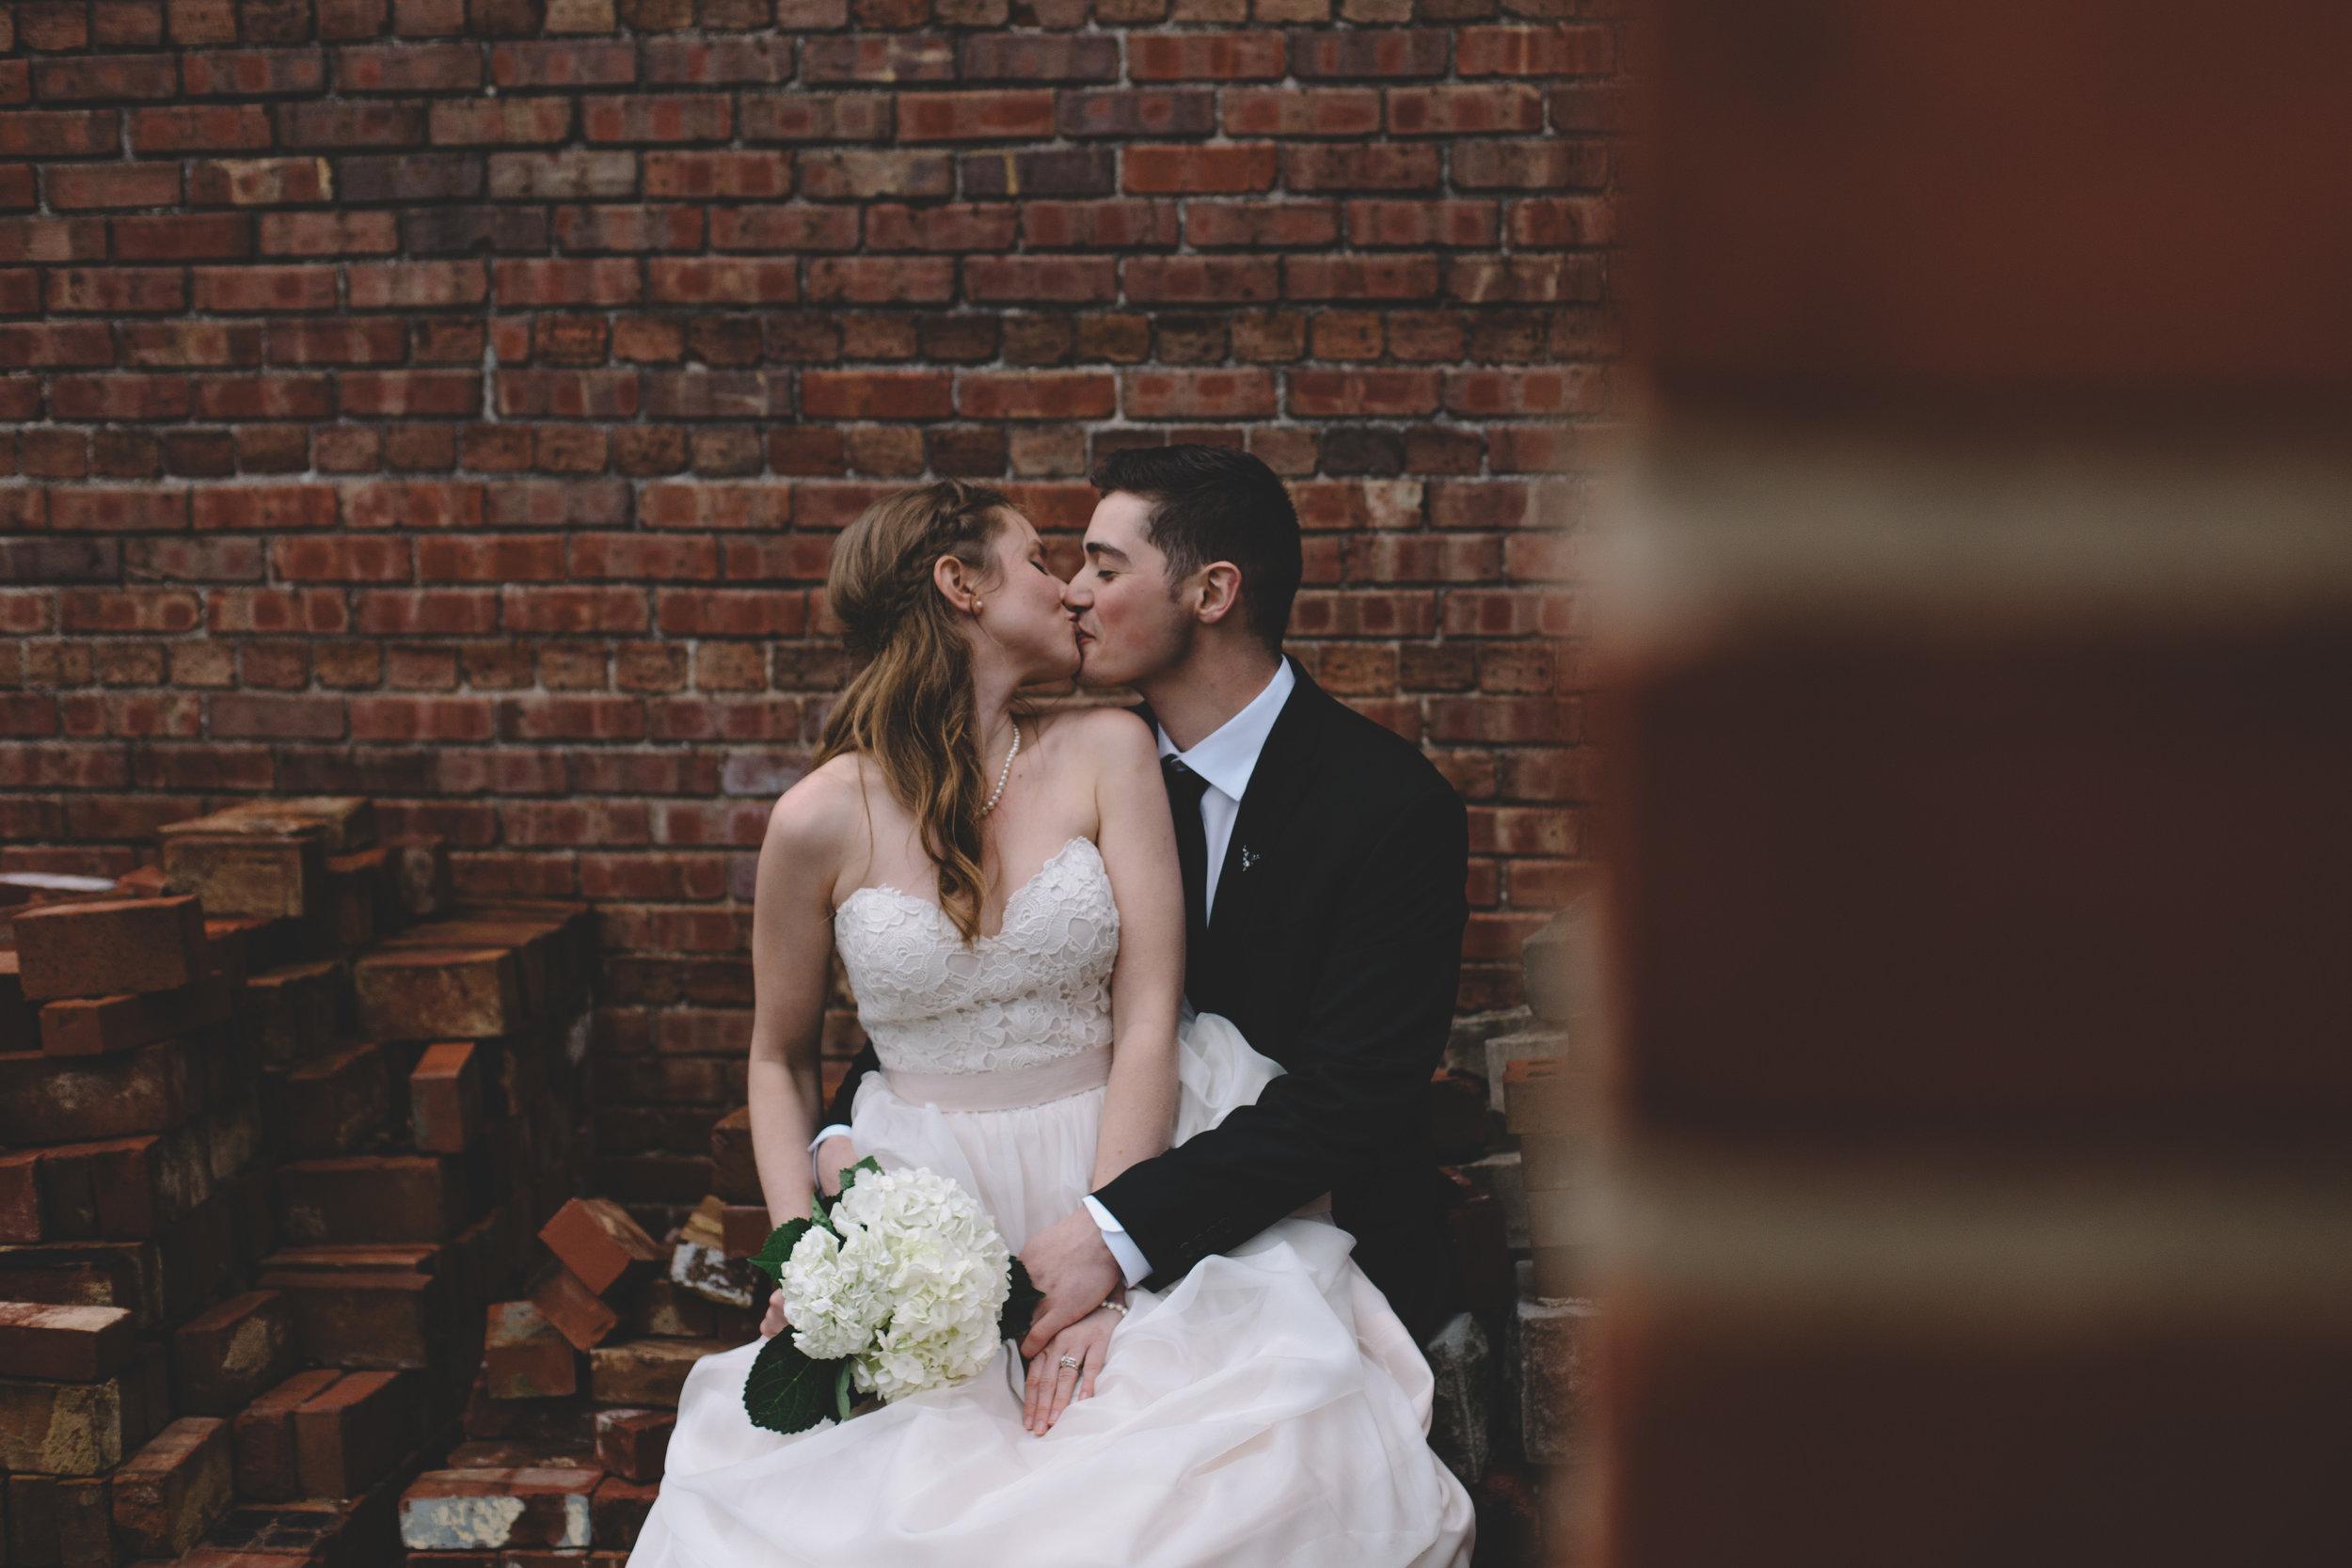 Jake + Brittney Balbas Airbnb Carriage House Wedding Evansville IN (322 of 426).jpg